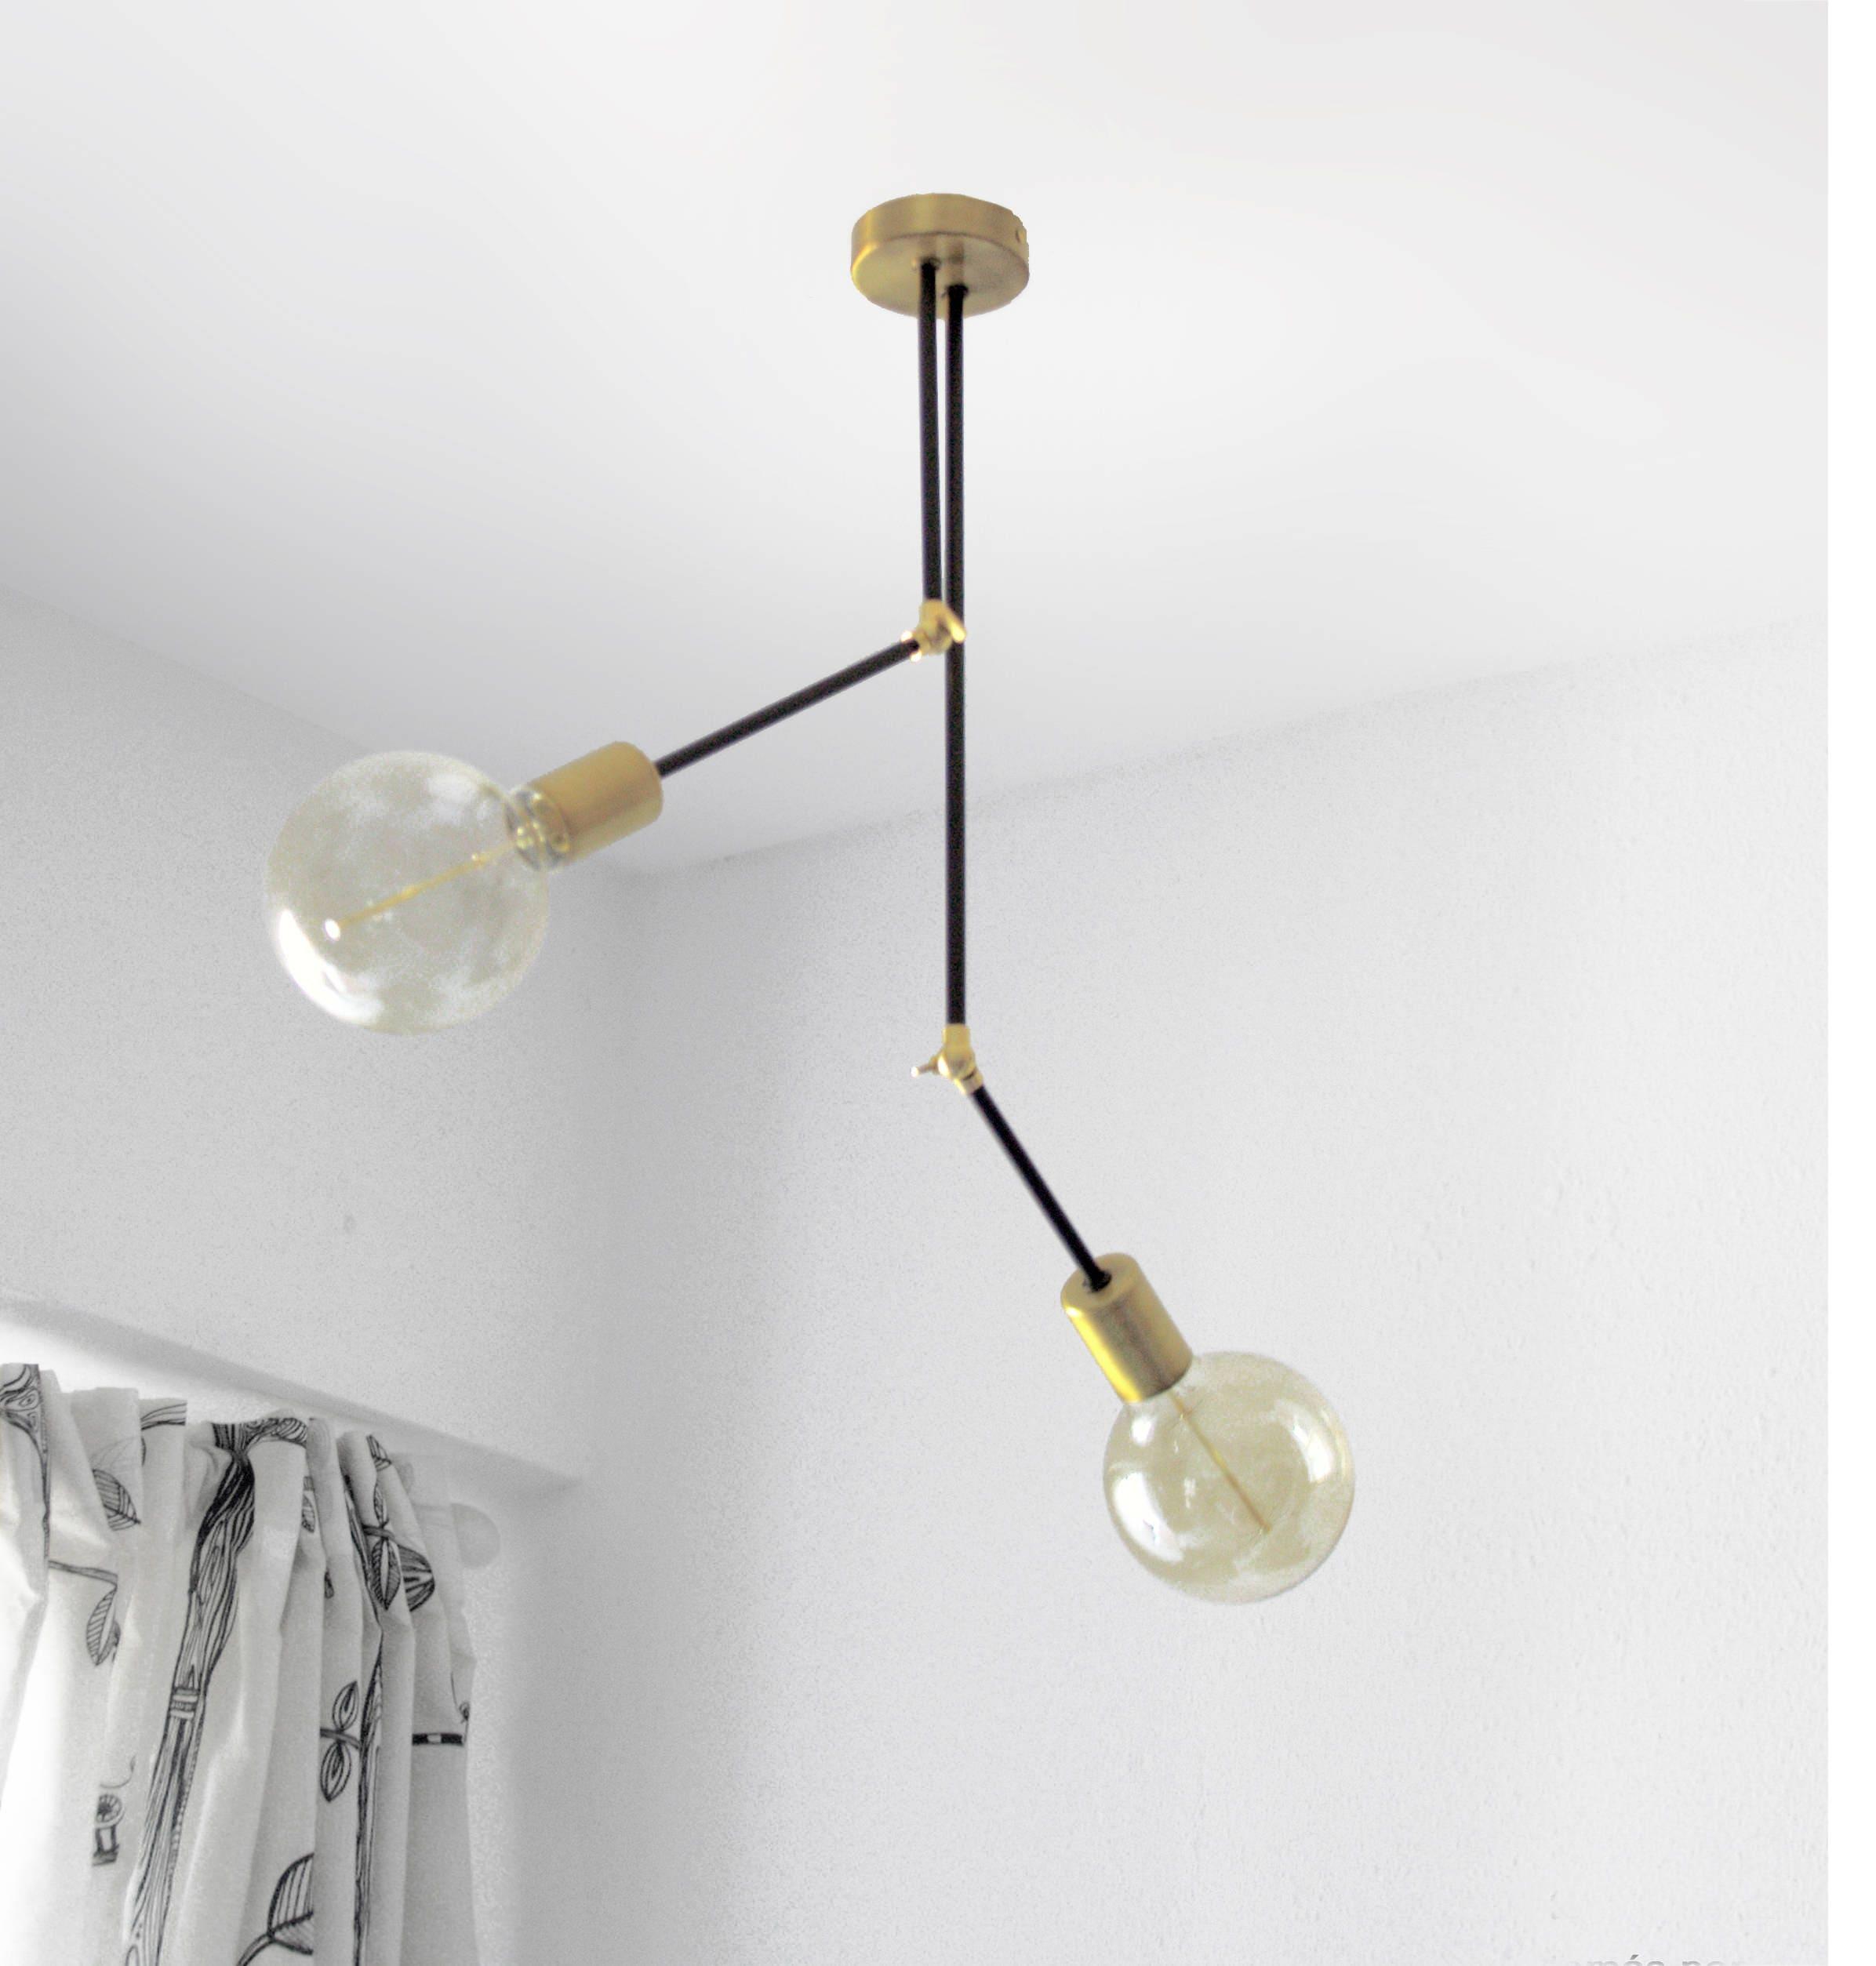 Articulated ceiling light 2 arm semi flush mount light zoom arubaitofo Gallery